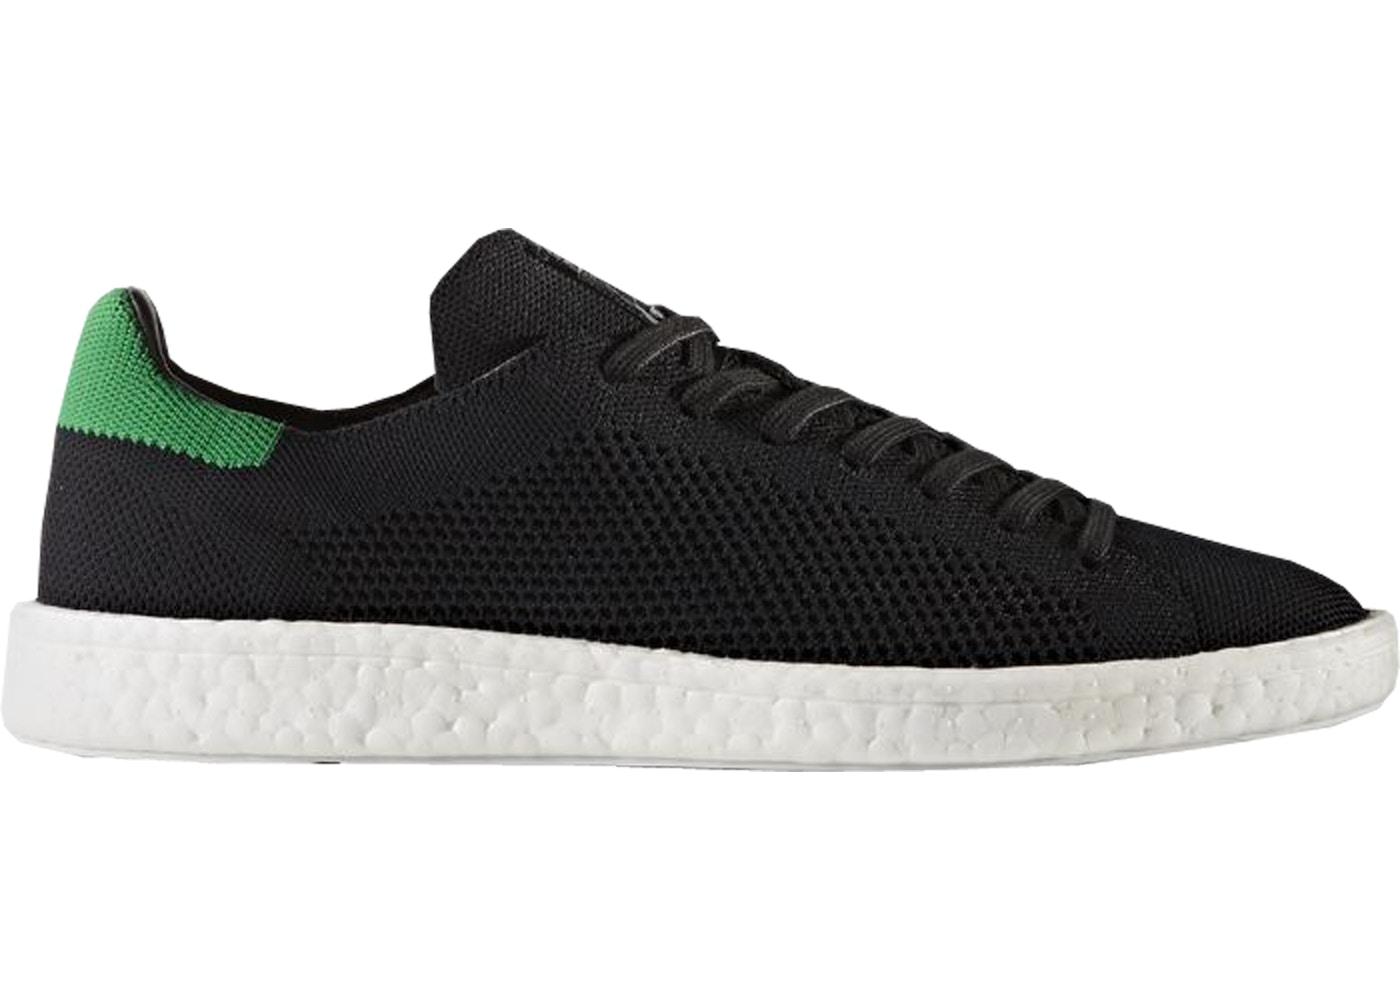 adidas Stan Smith Boost Primeknit Black Green - BZ0095